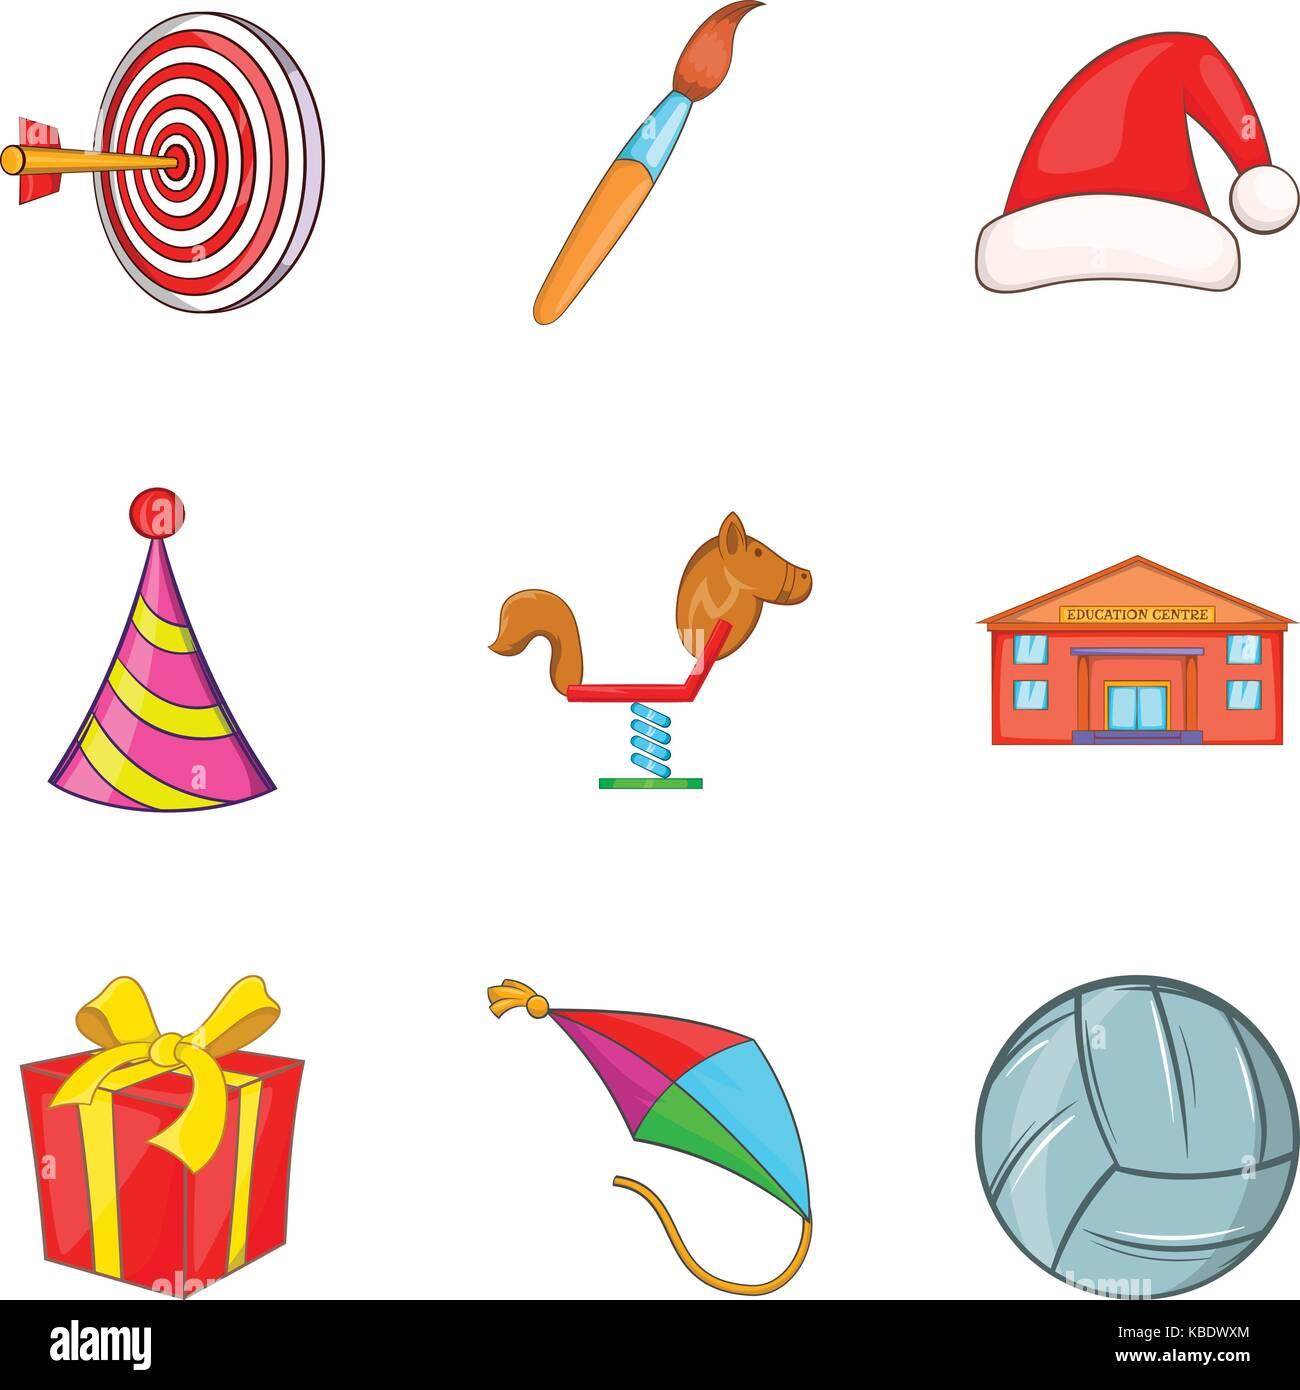 Toy store icons set, cartoon style - Stock Image